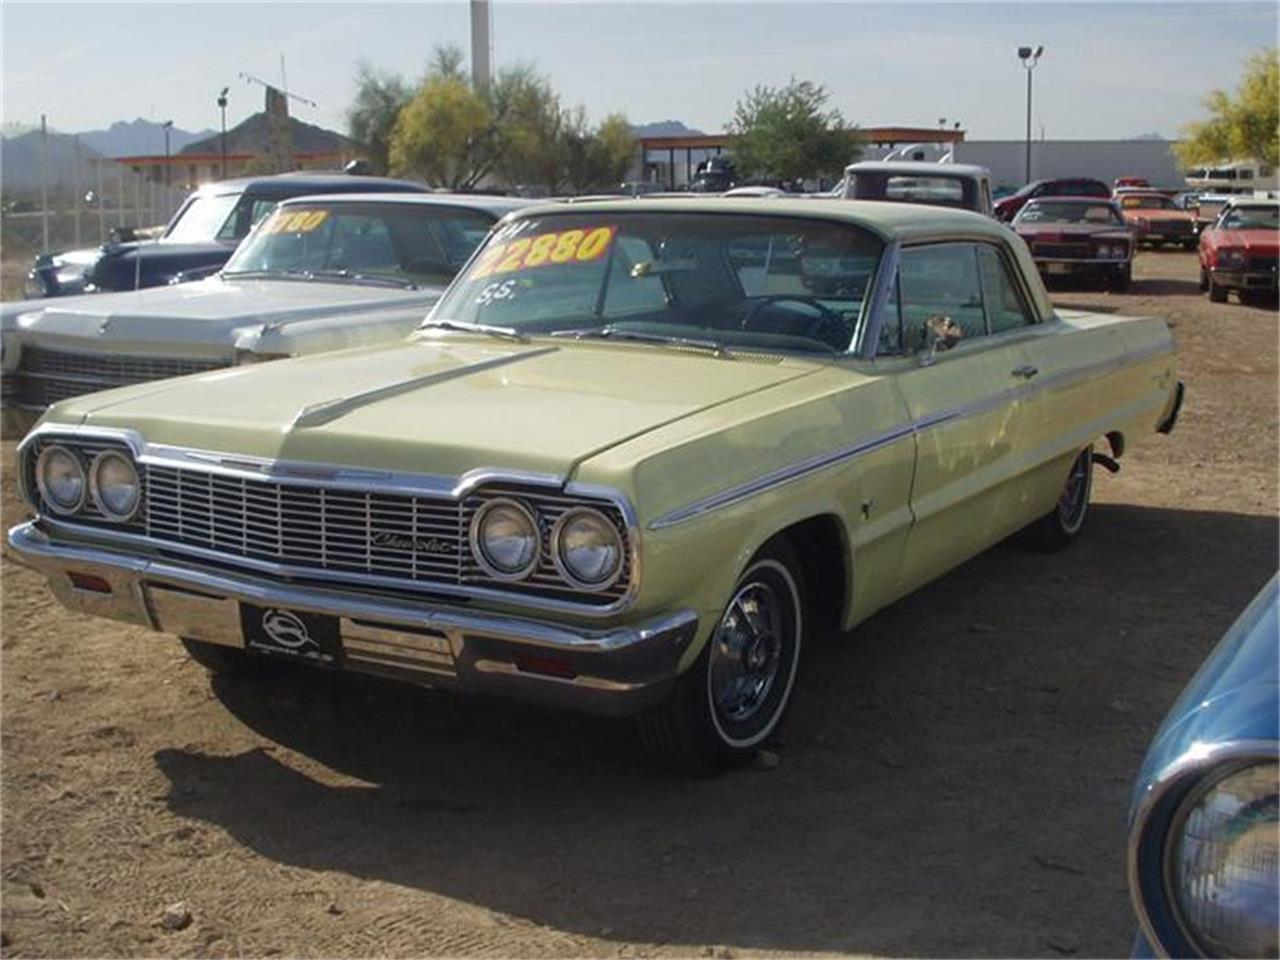 1964 chevrolet impala ss for sale cc 429873. Black Bedroom Furniture Sets. Home Design Ideas